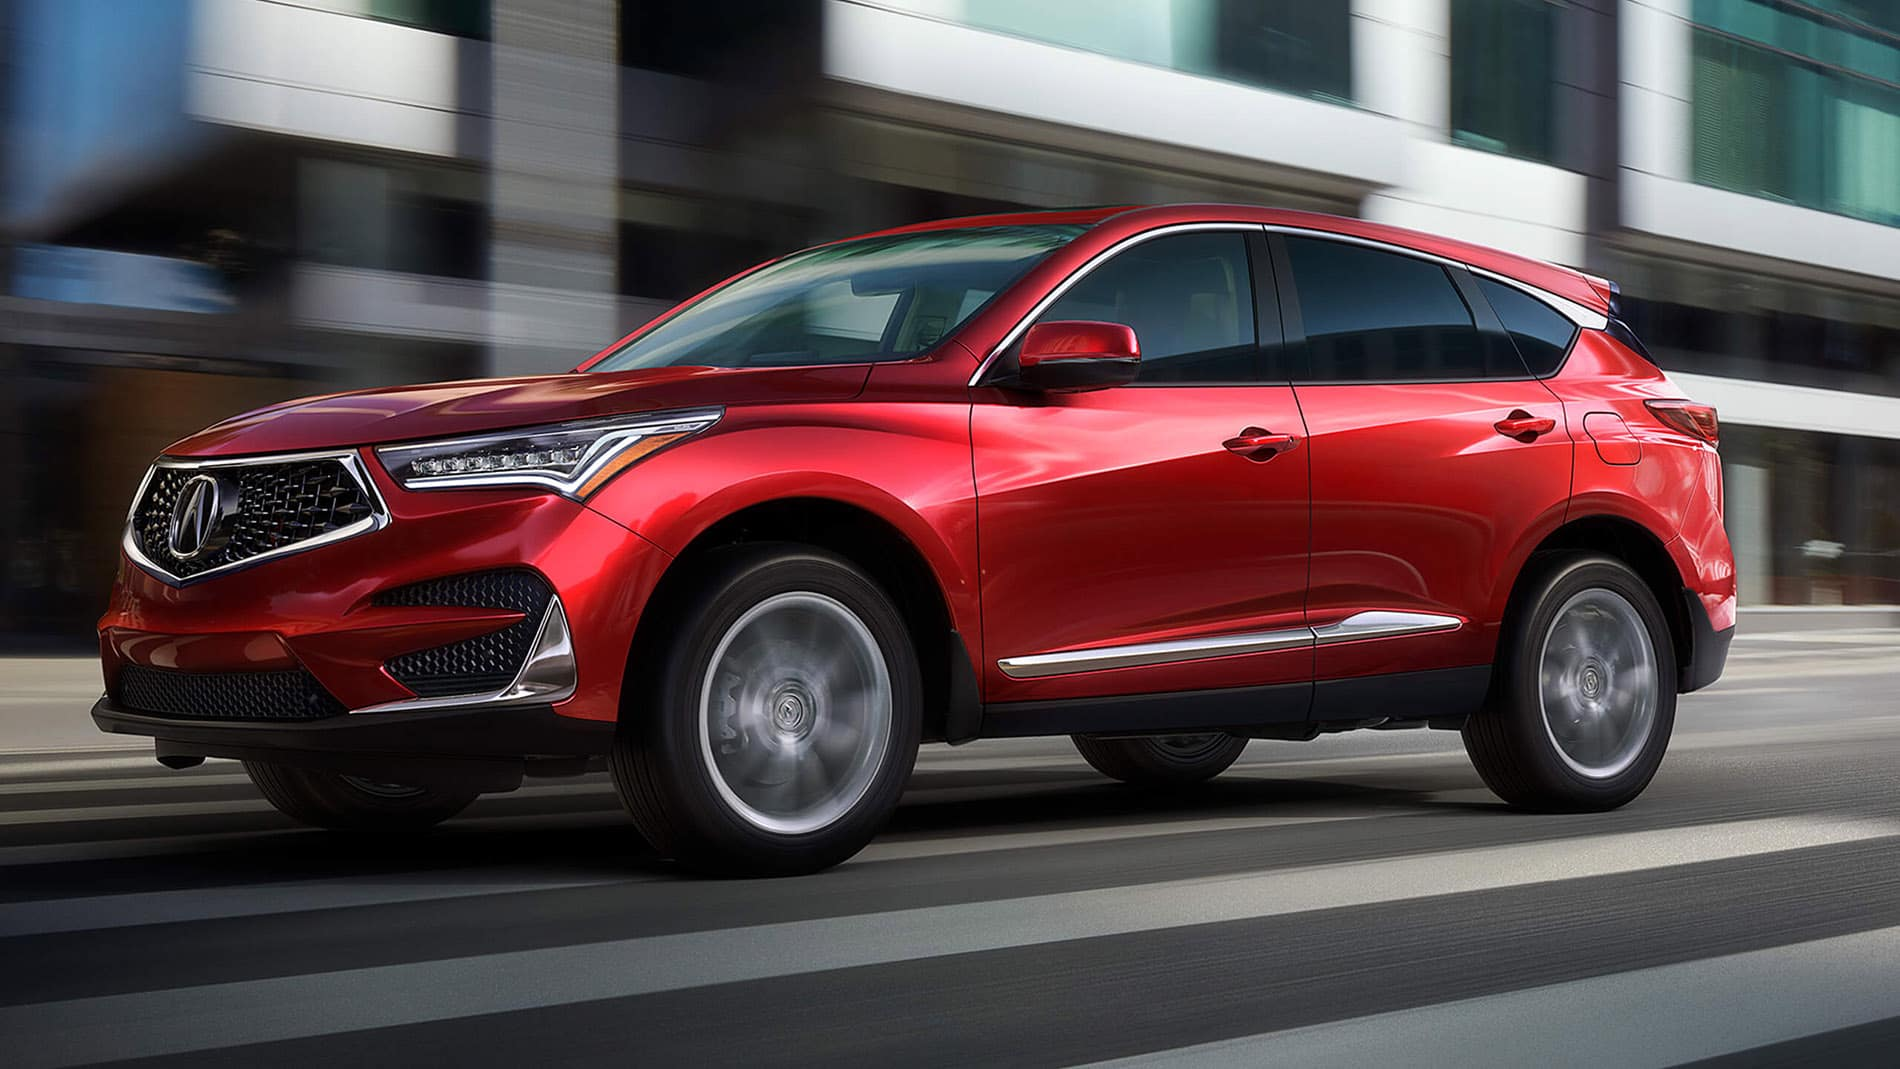 2019 Acura RDX red